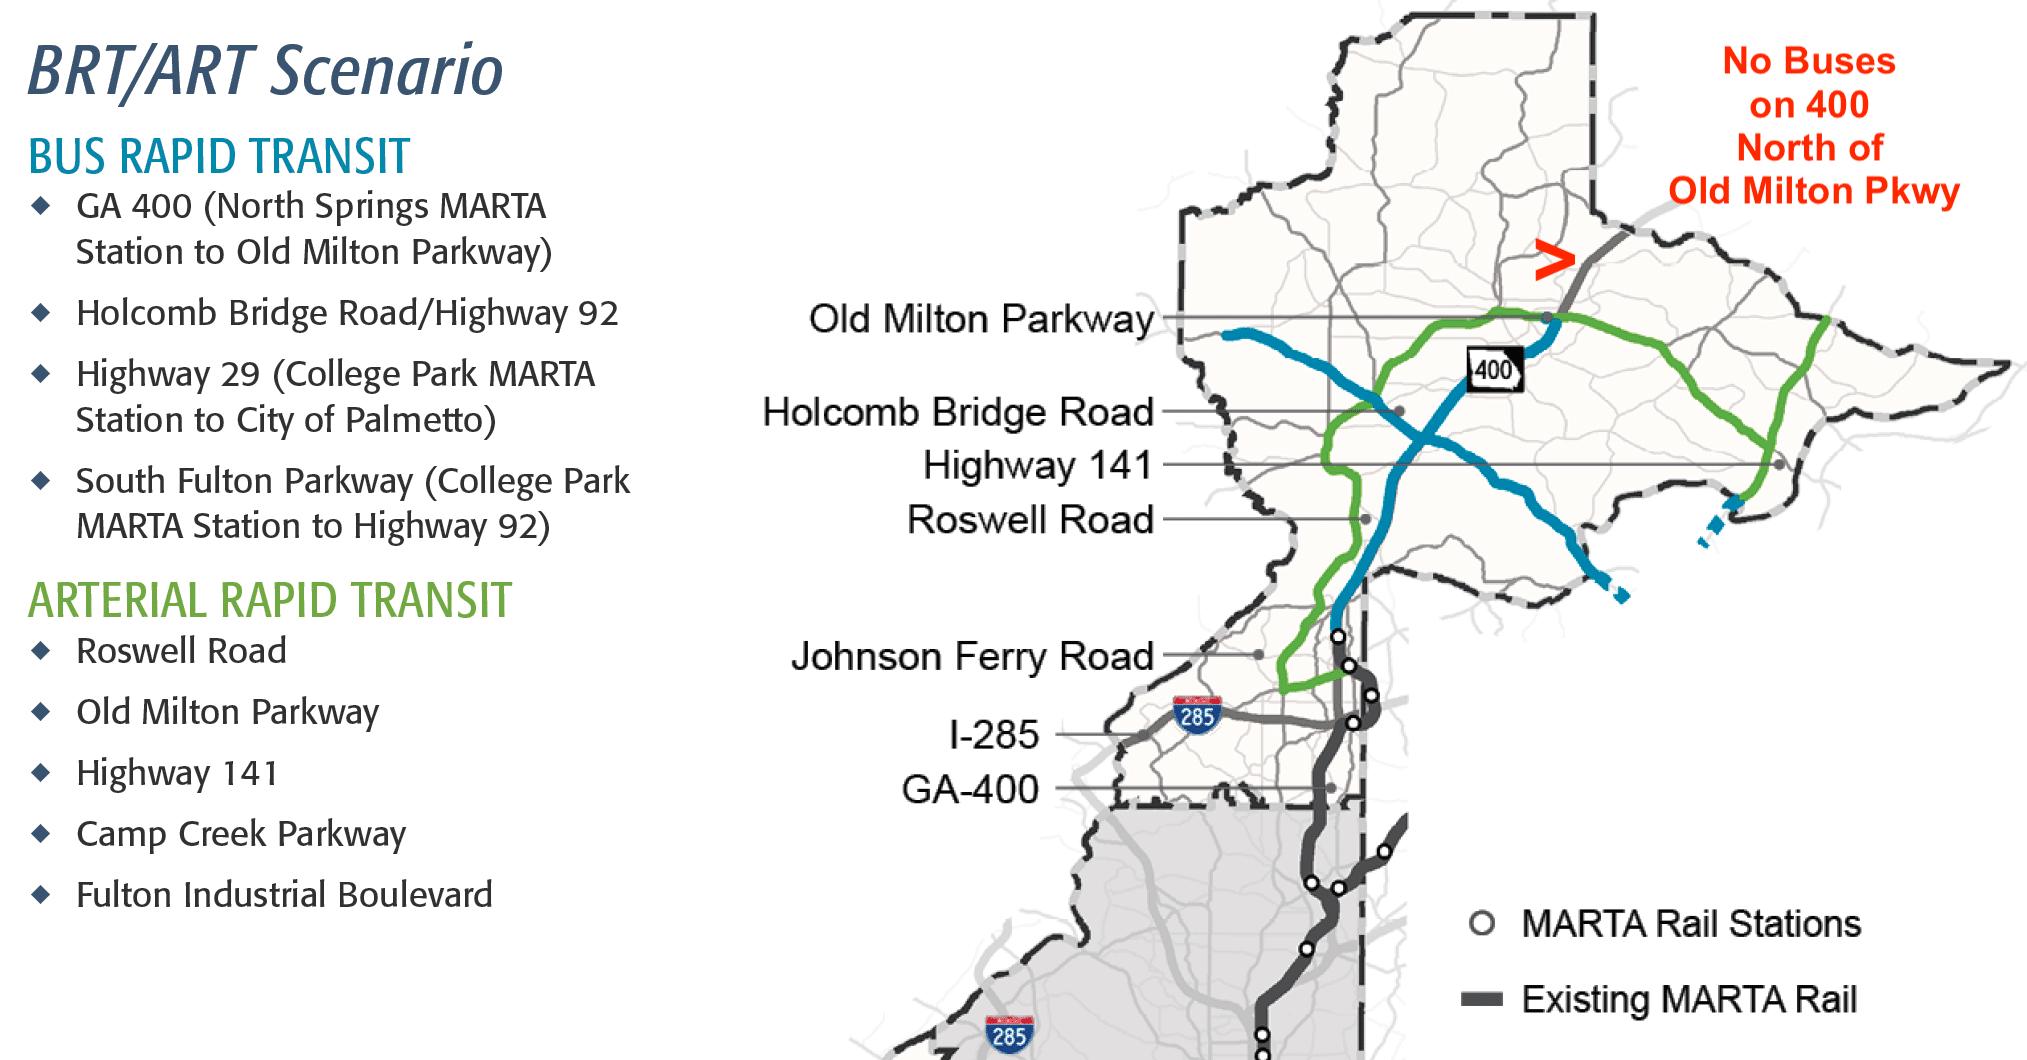 Proposed Marta Map for North Fulton - https://www.johnscreekpost.com